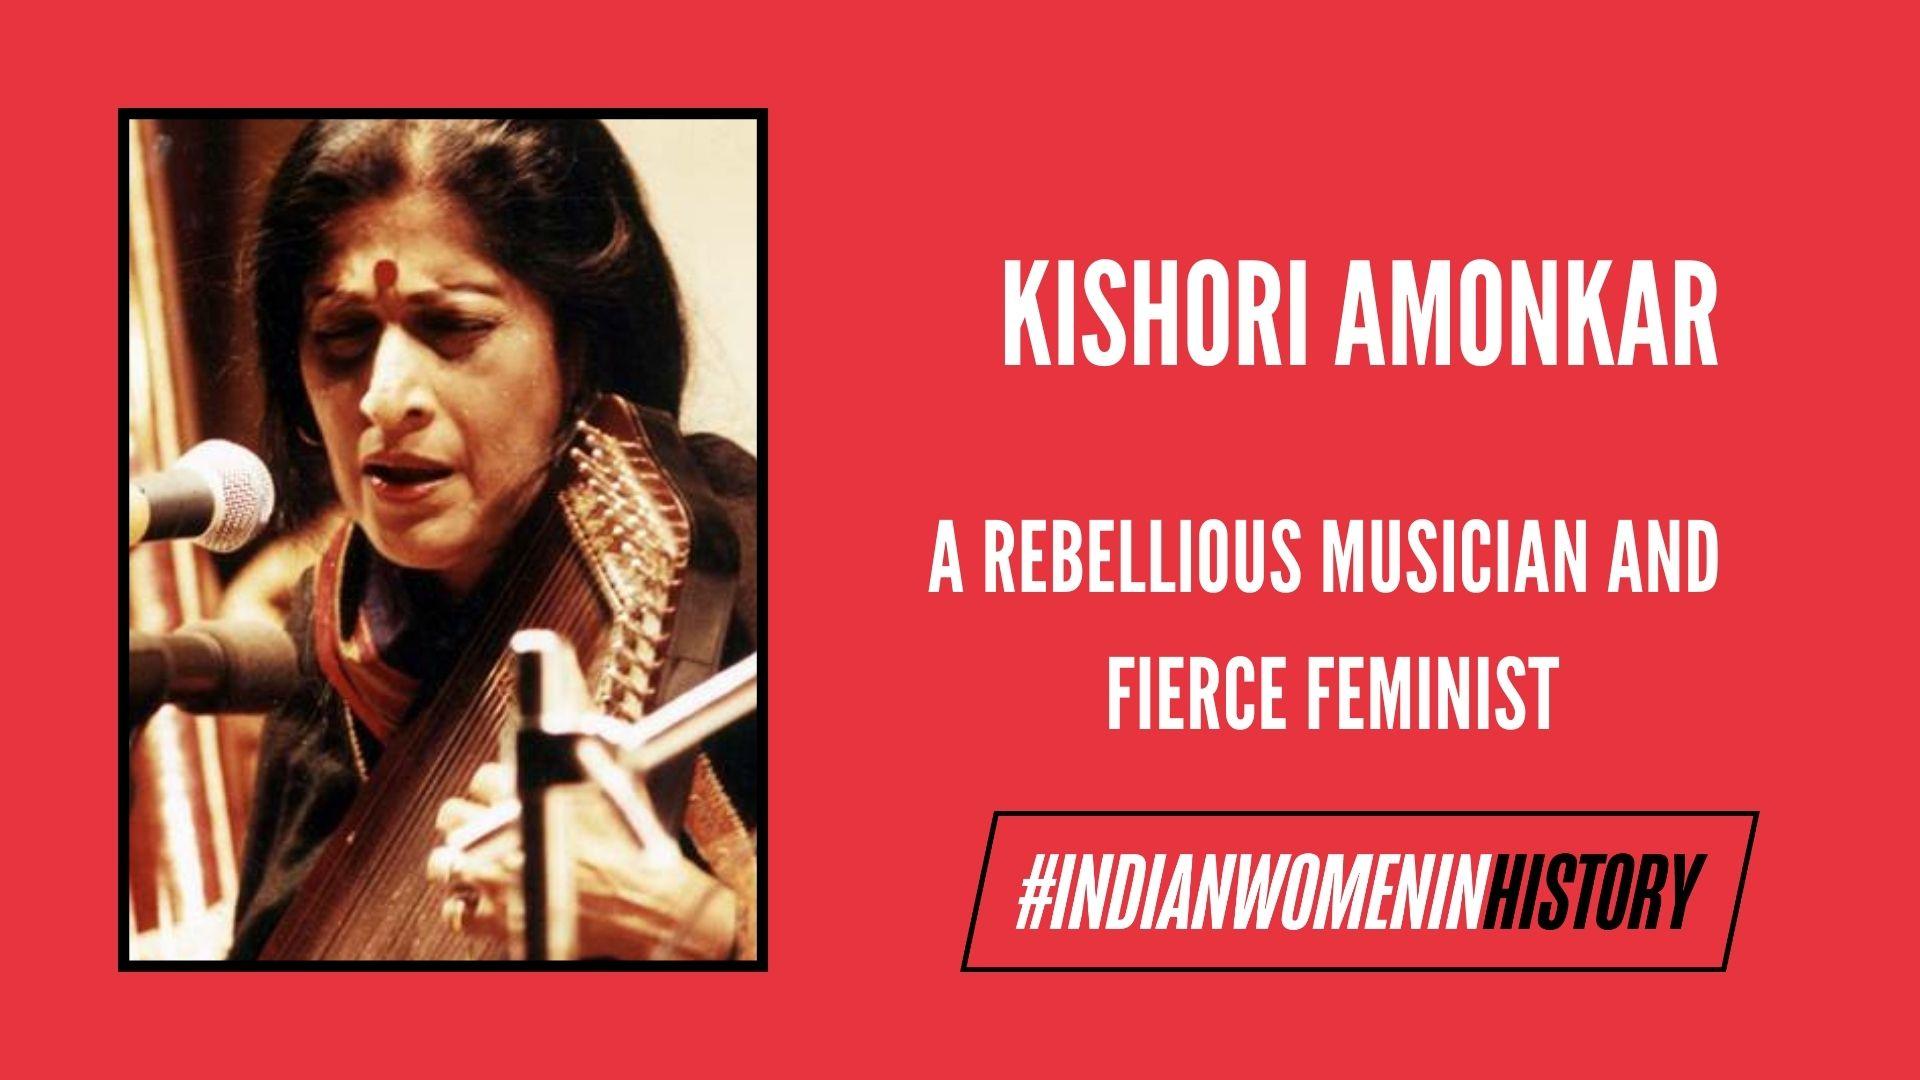 Kishori Amonkar: Rebellious Musician And Fierce Feminist | #IndianWomeninHistory